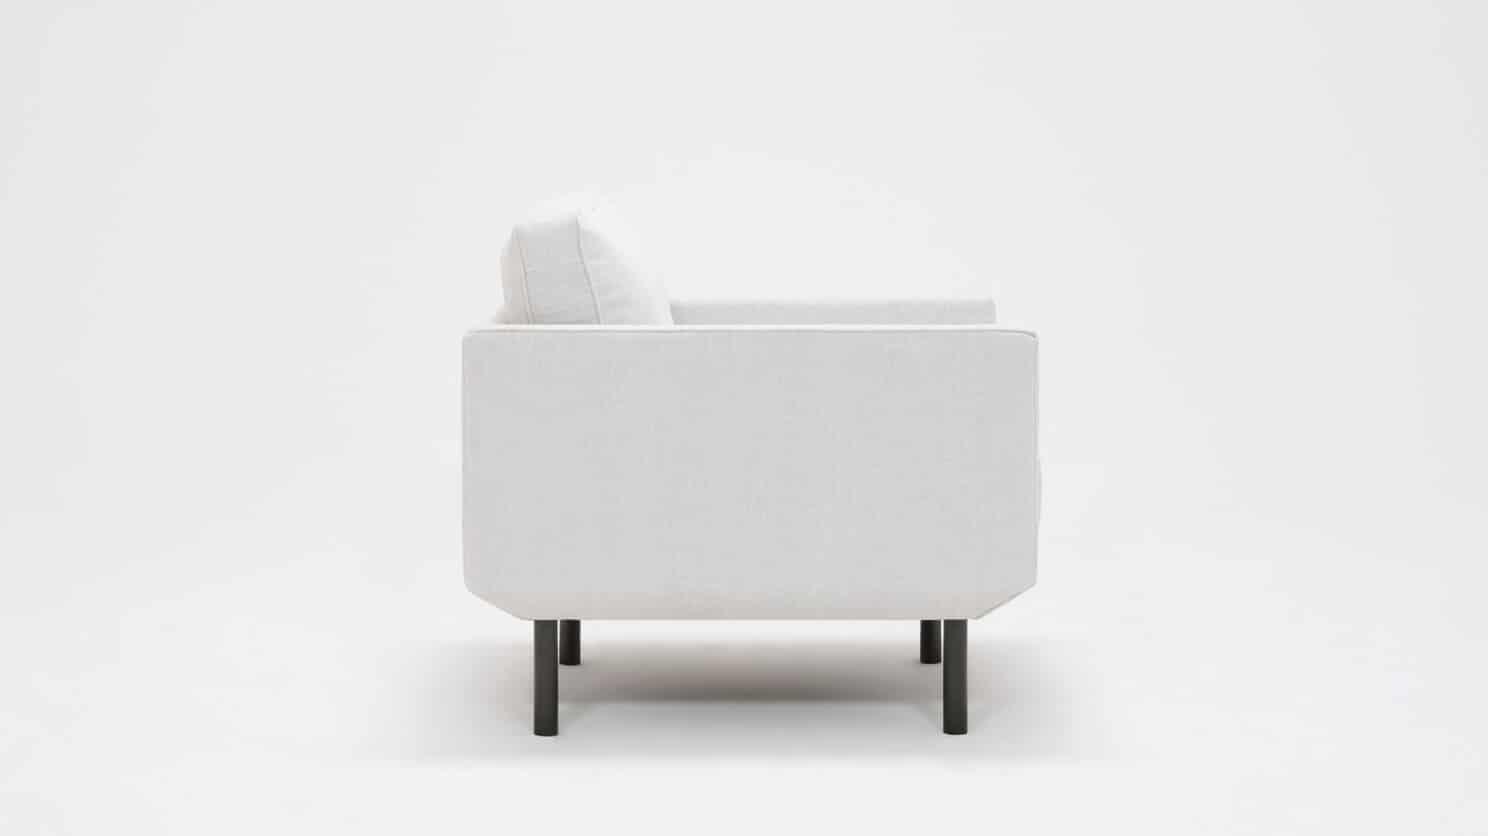 30154 95 4 chairs plateau club chair feather coda marble side 01